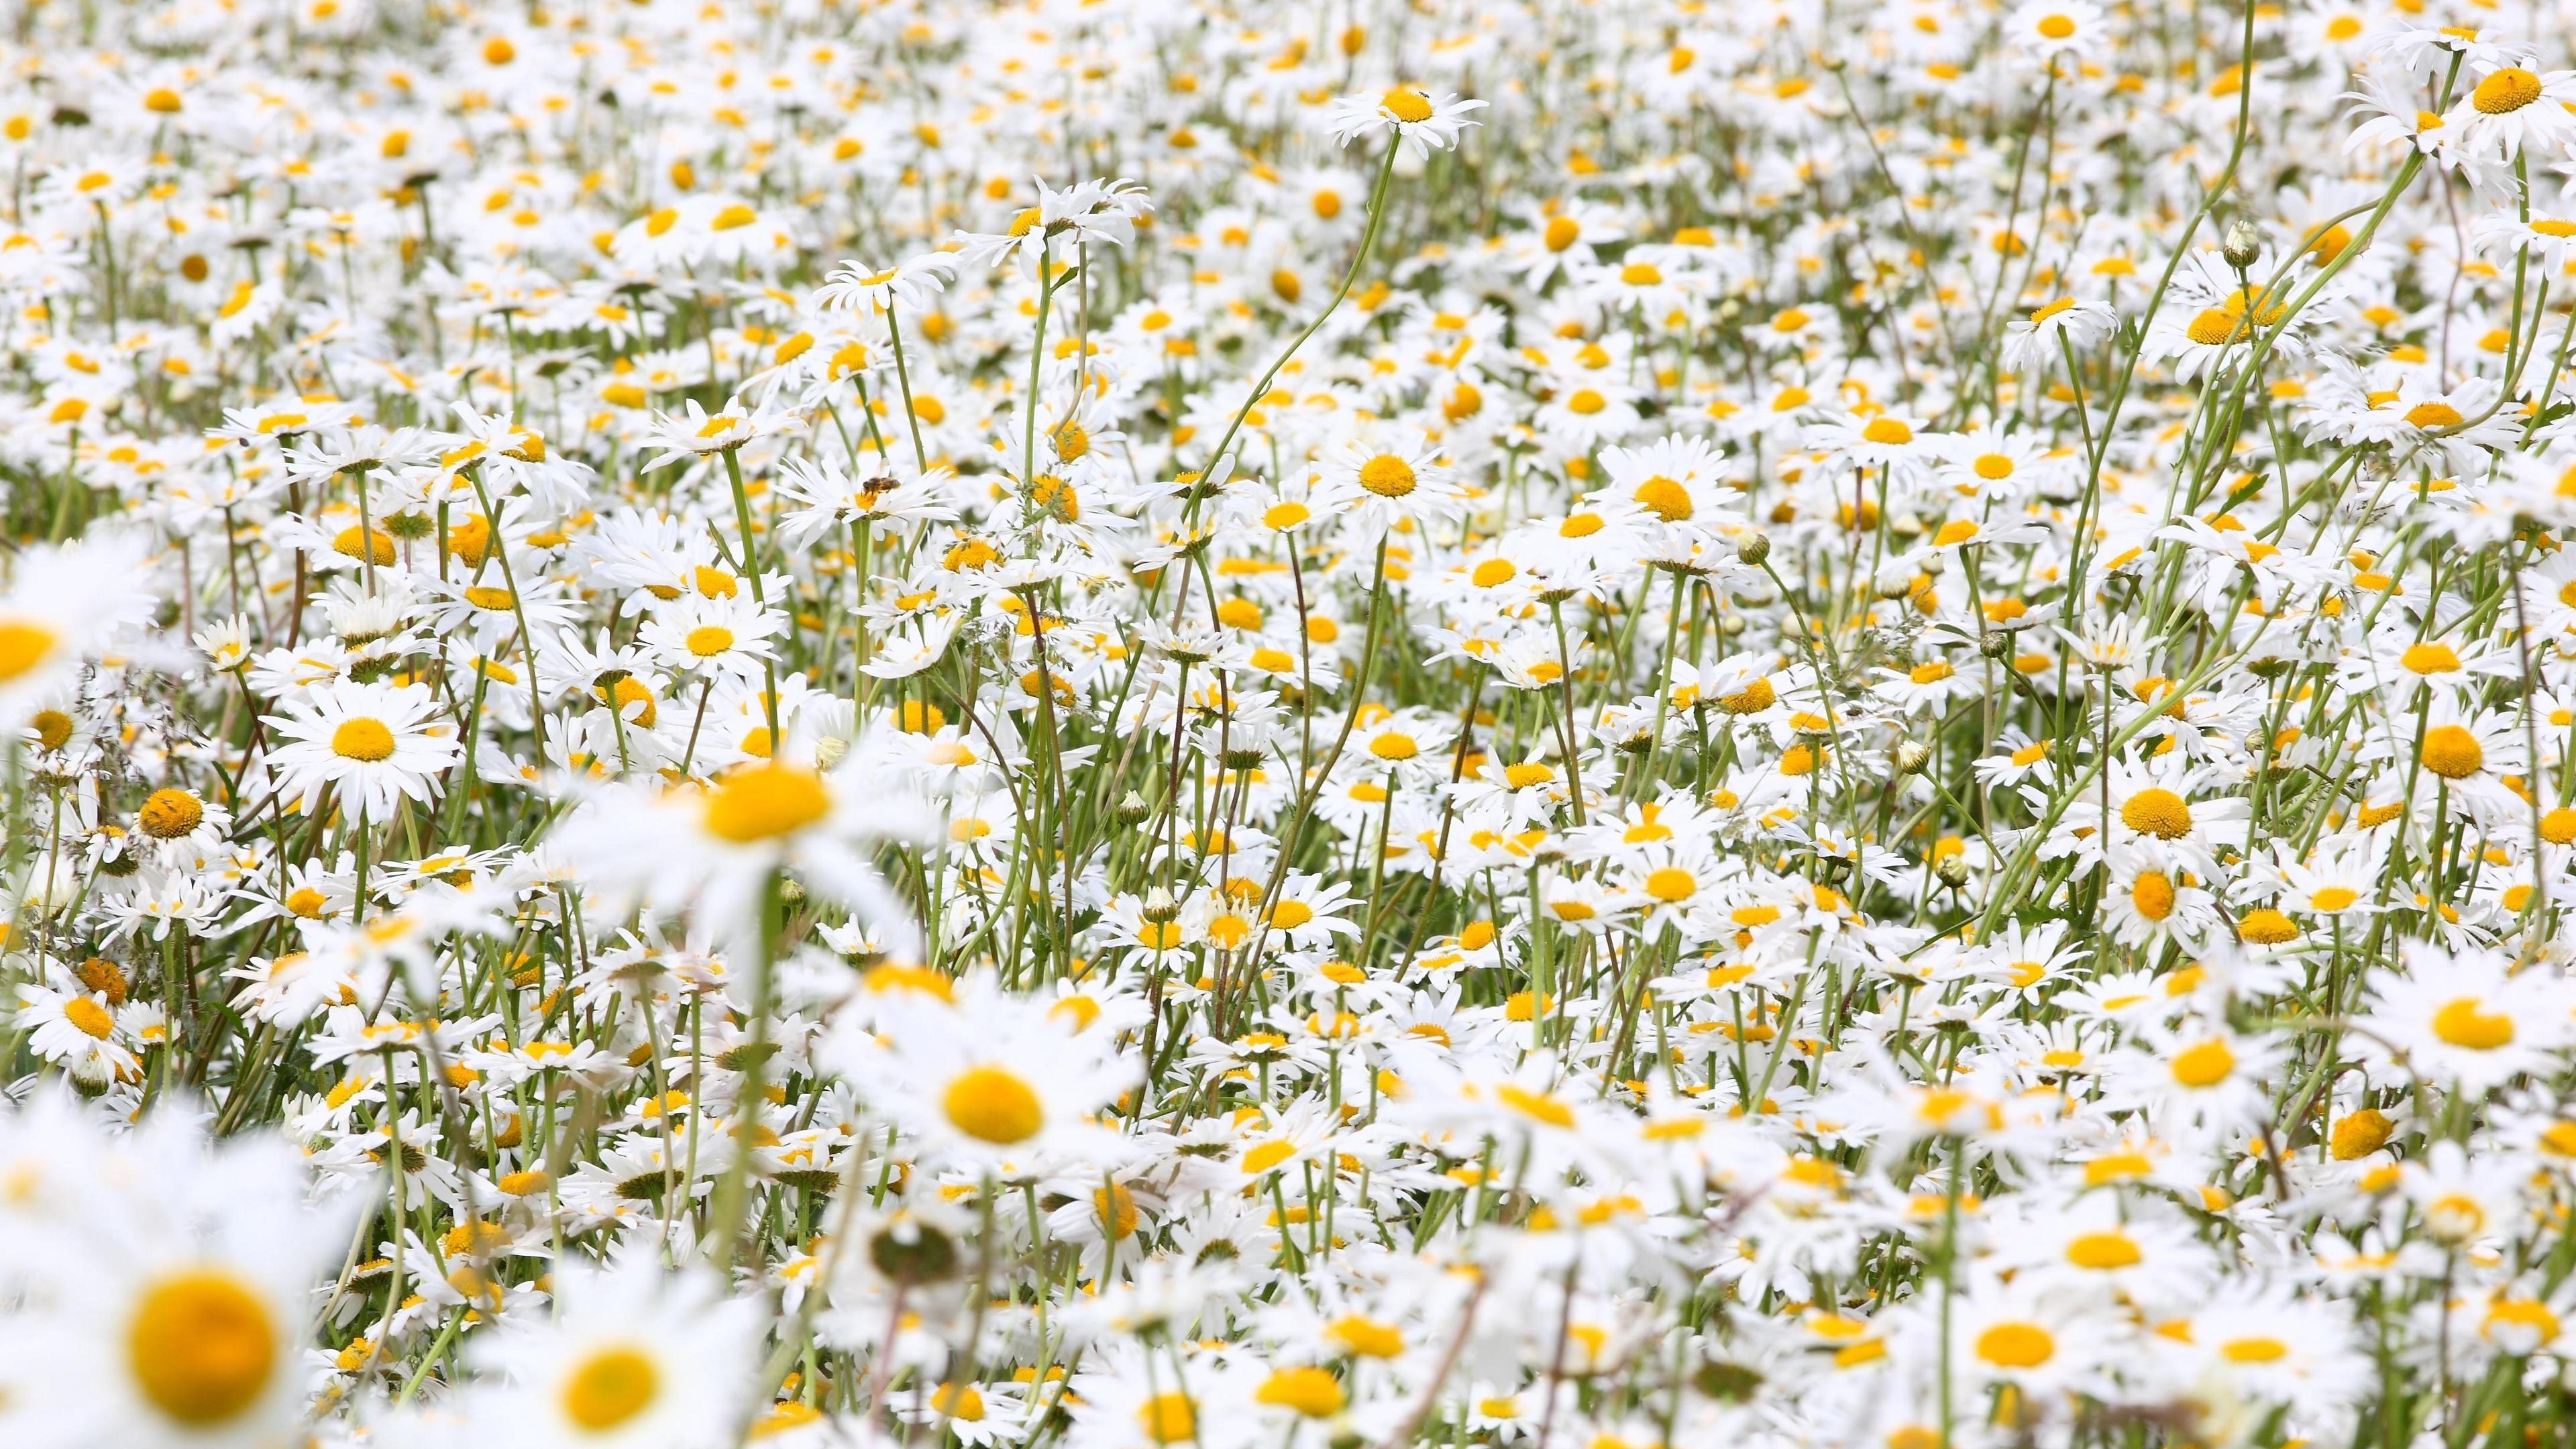 daisies flowers field many summer 4k 1540065044 - daisies, flowers, field, many, summer 4k - Flowers, Field, Daisies